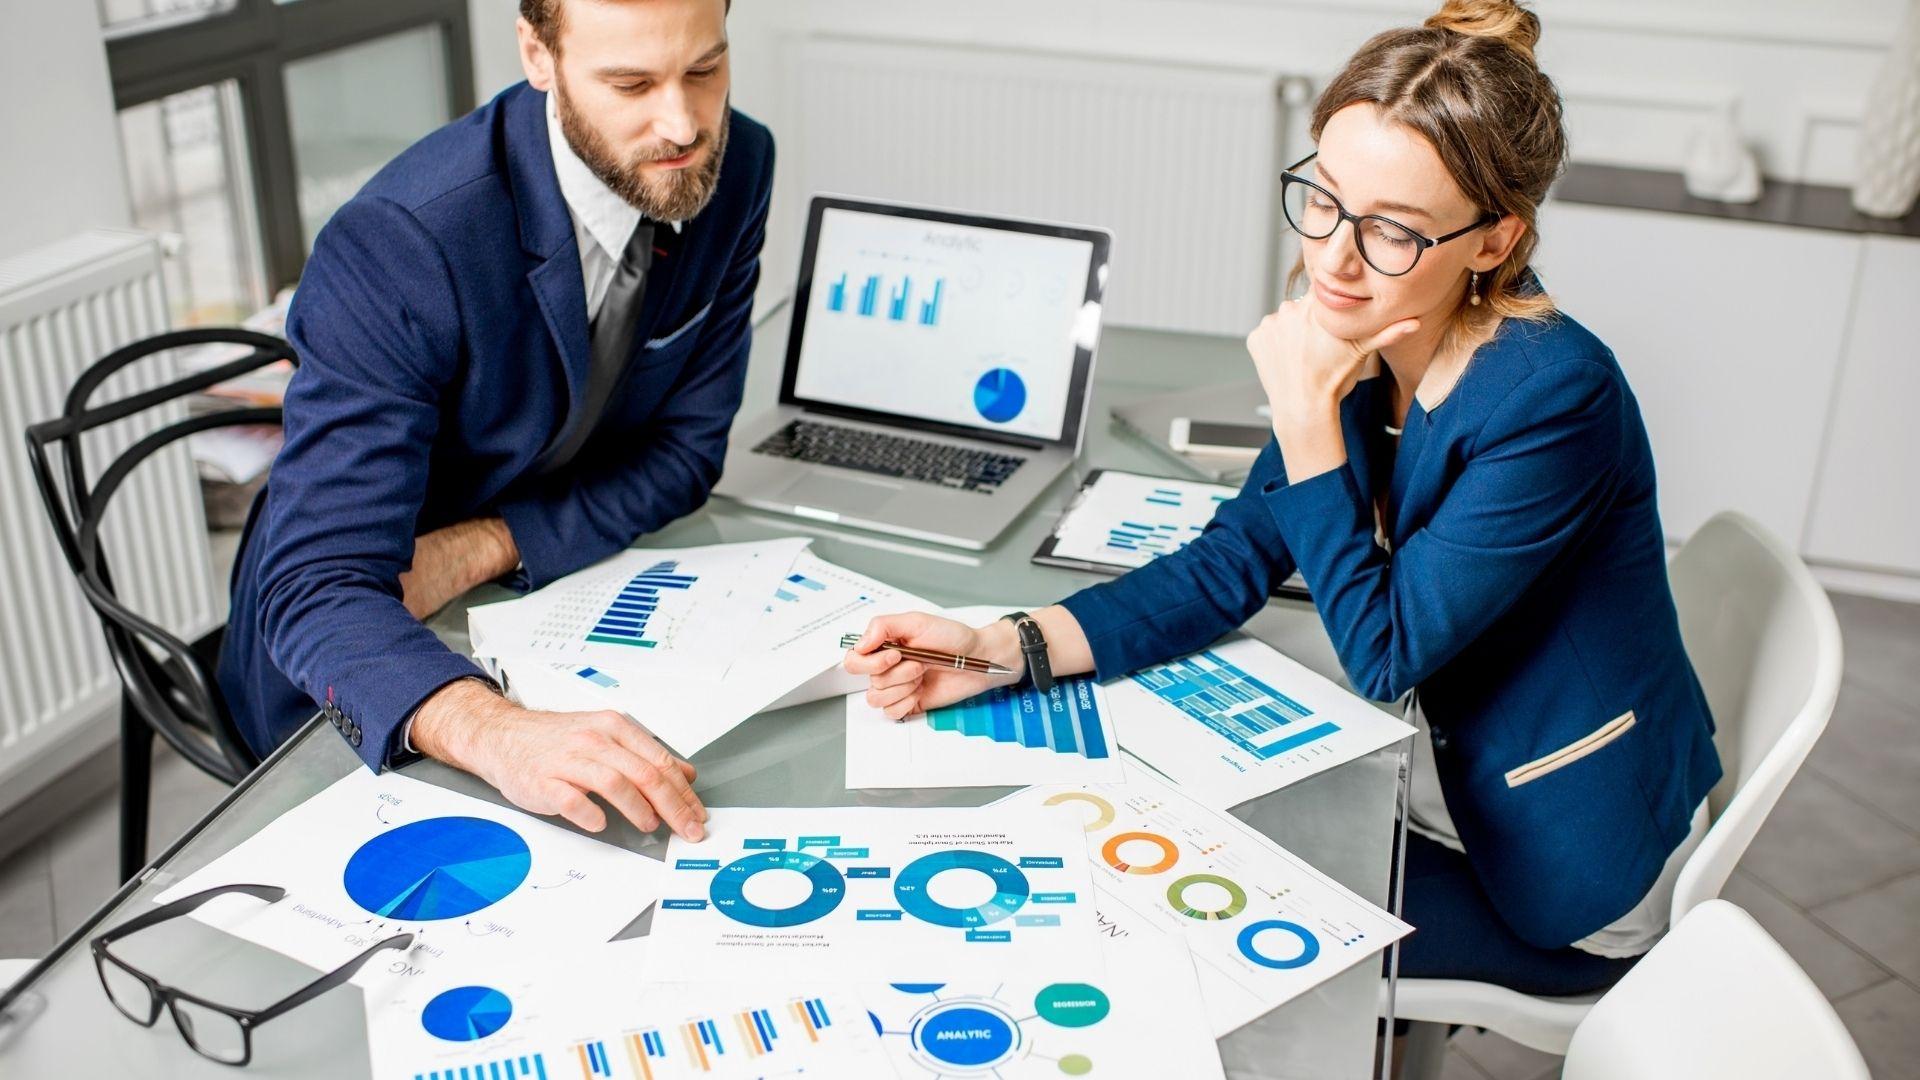 Episode 362 Business English Marketing Mini-Series 03 Marketing and Market Orientation